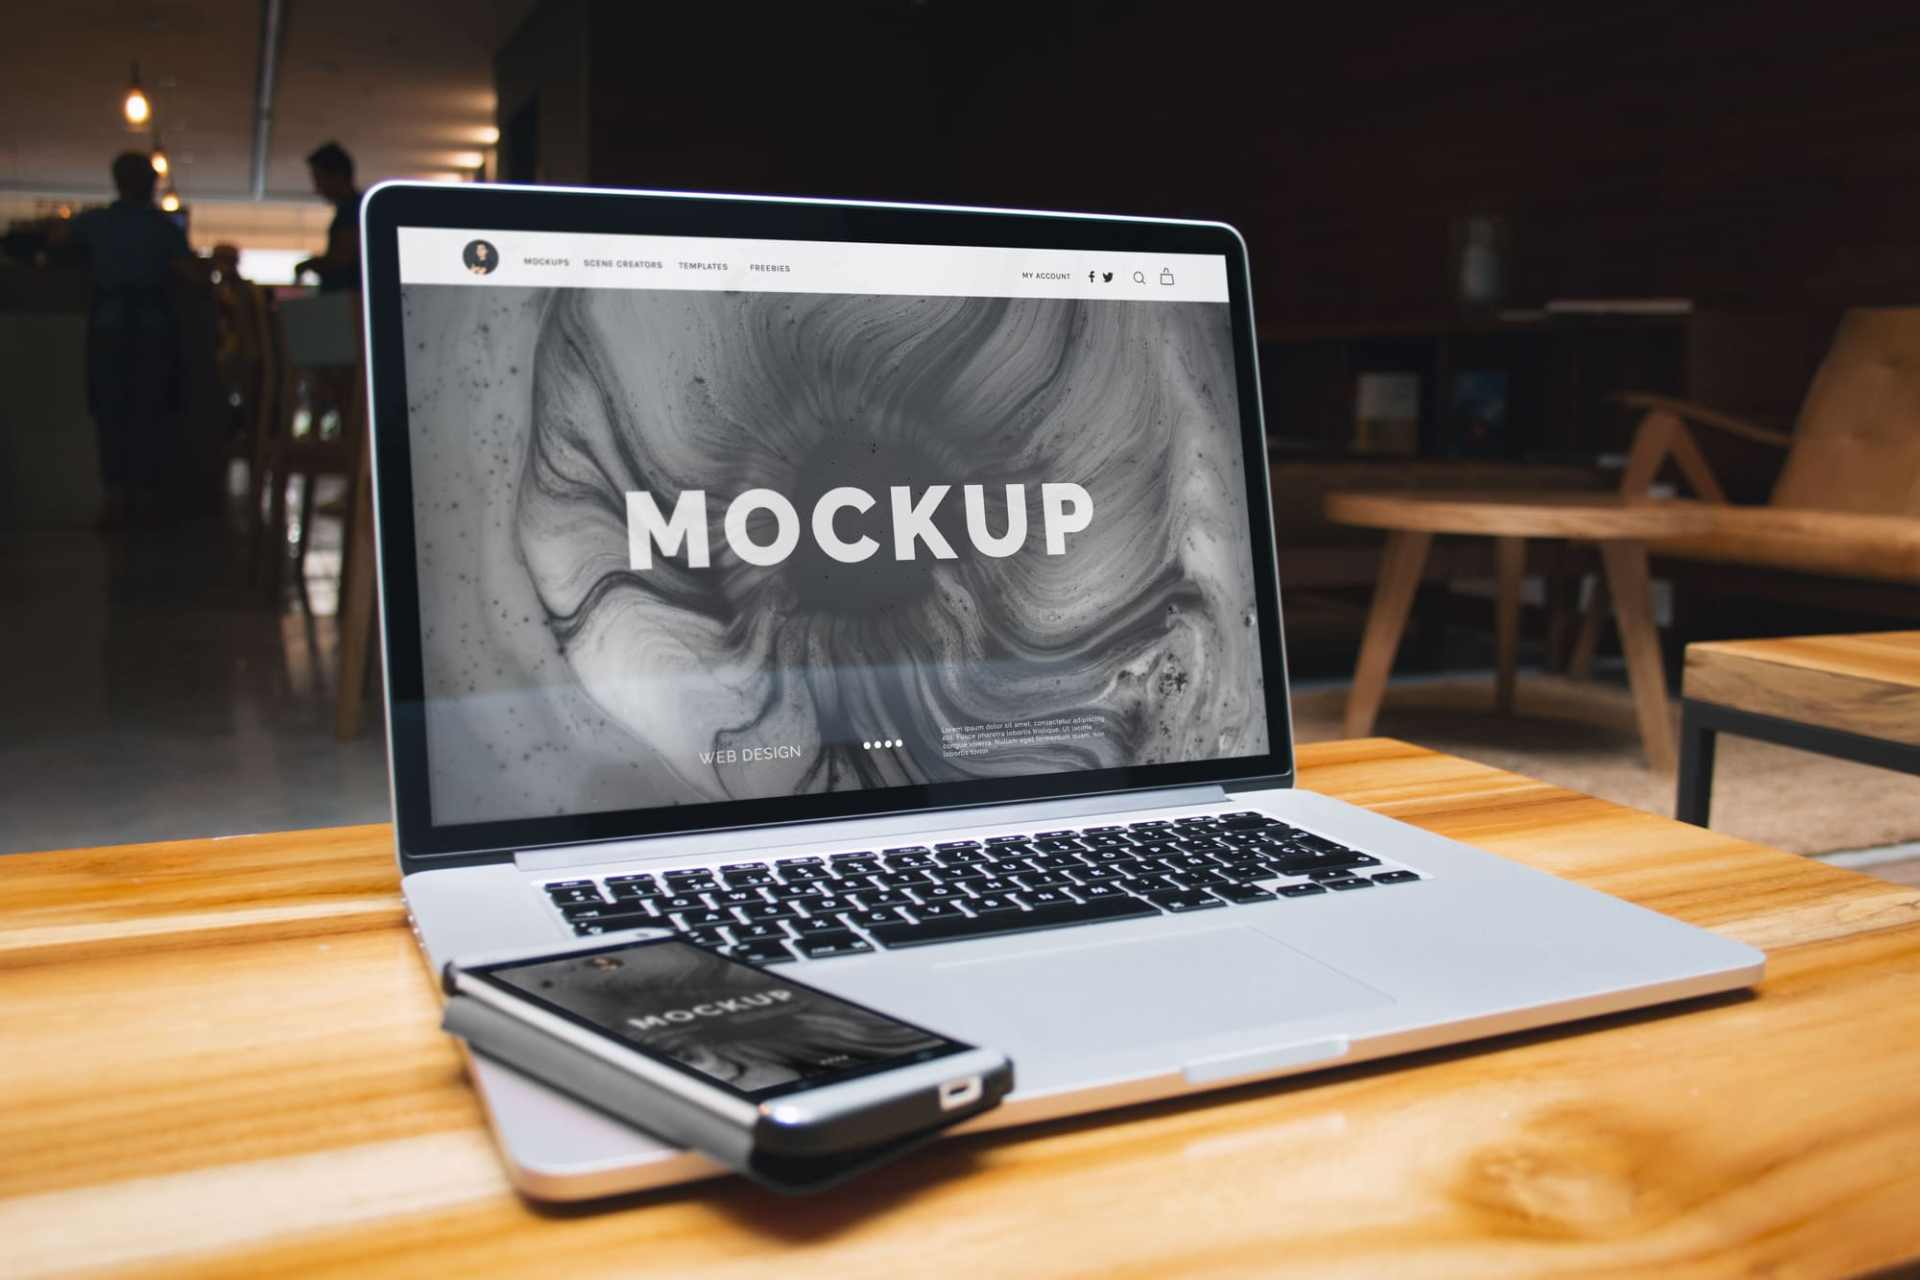 Free Mockup: Macbook Pro Retina and Mobile Device